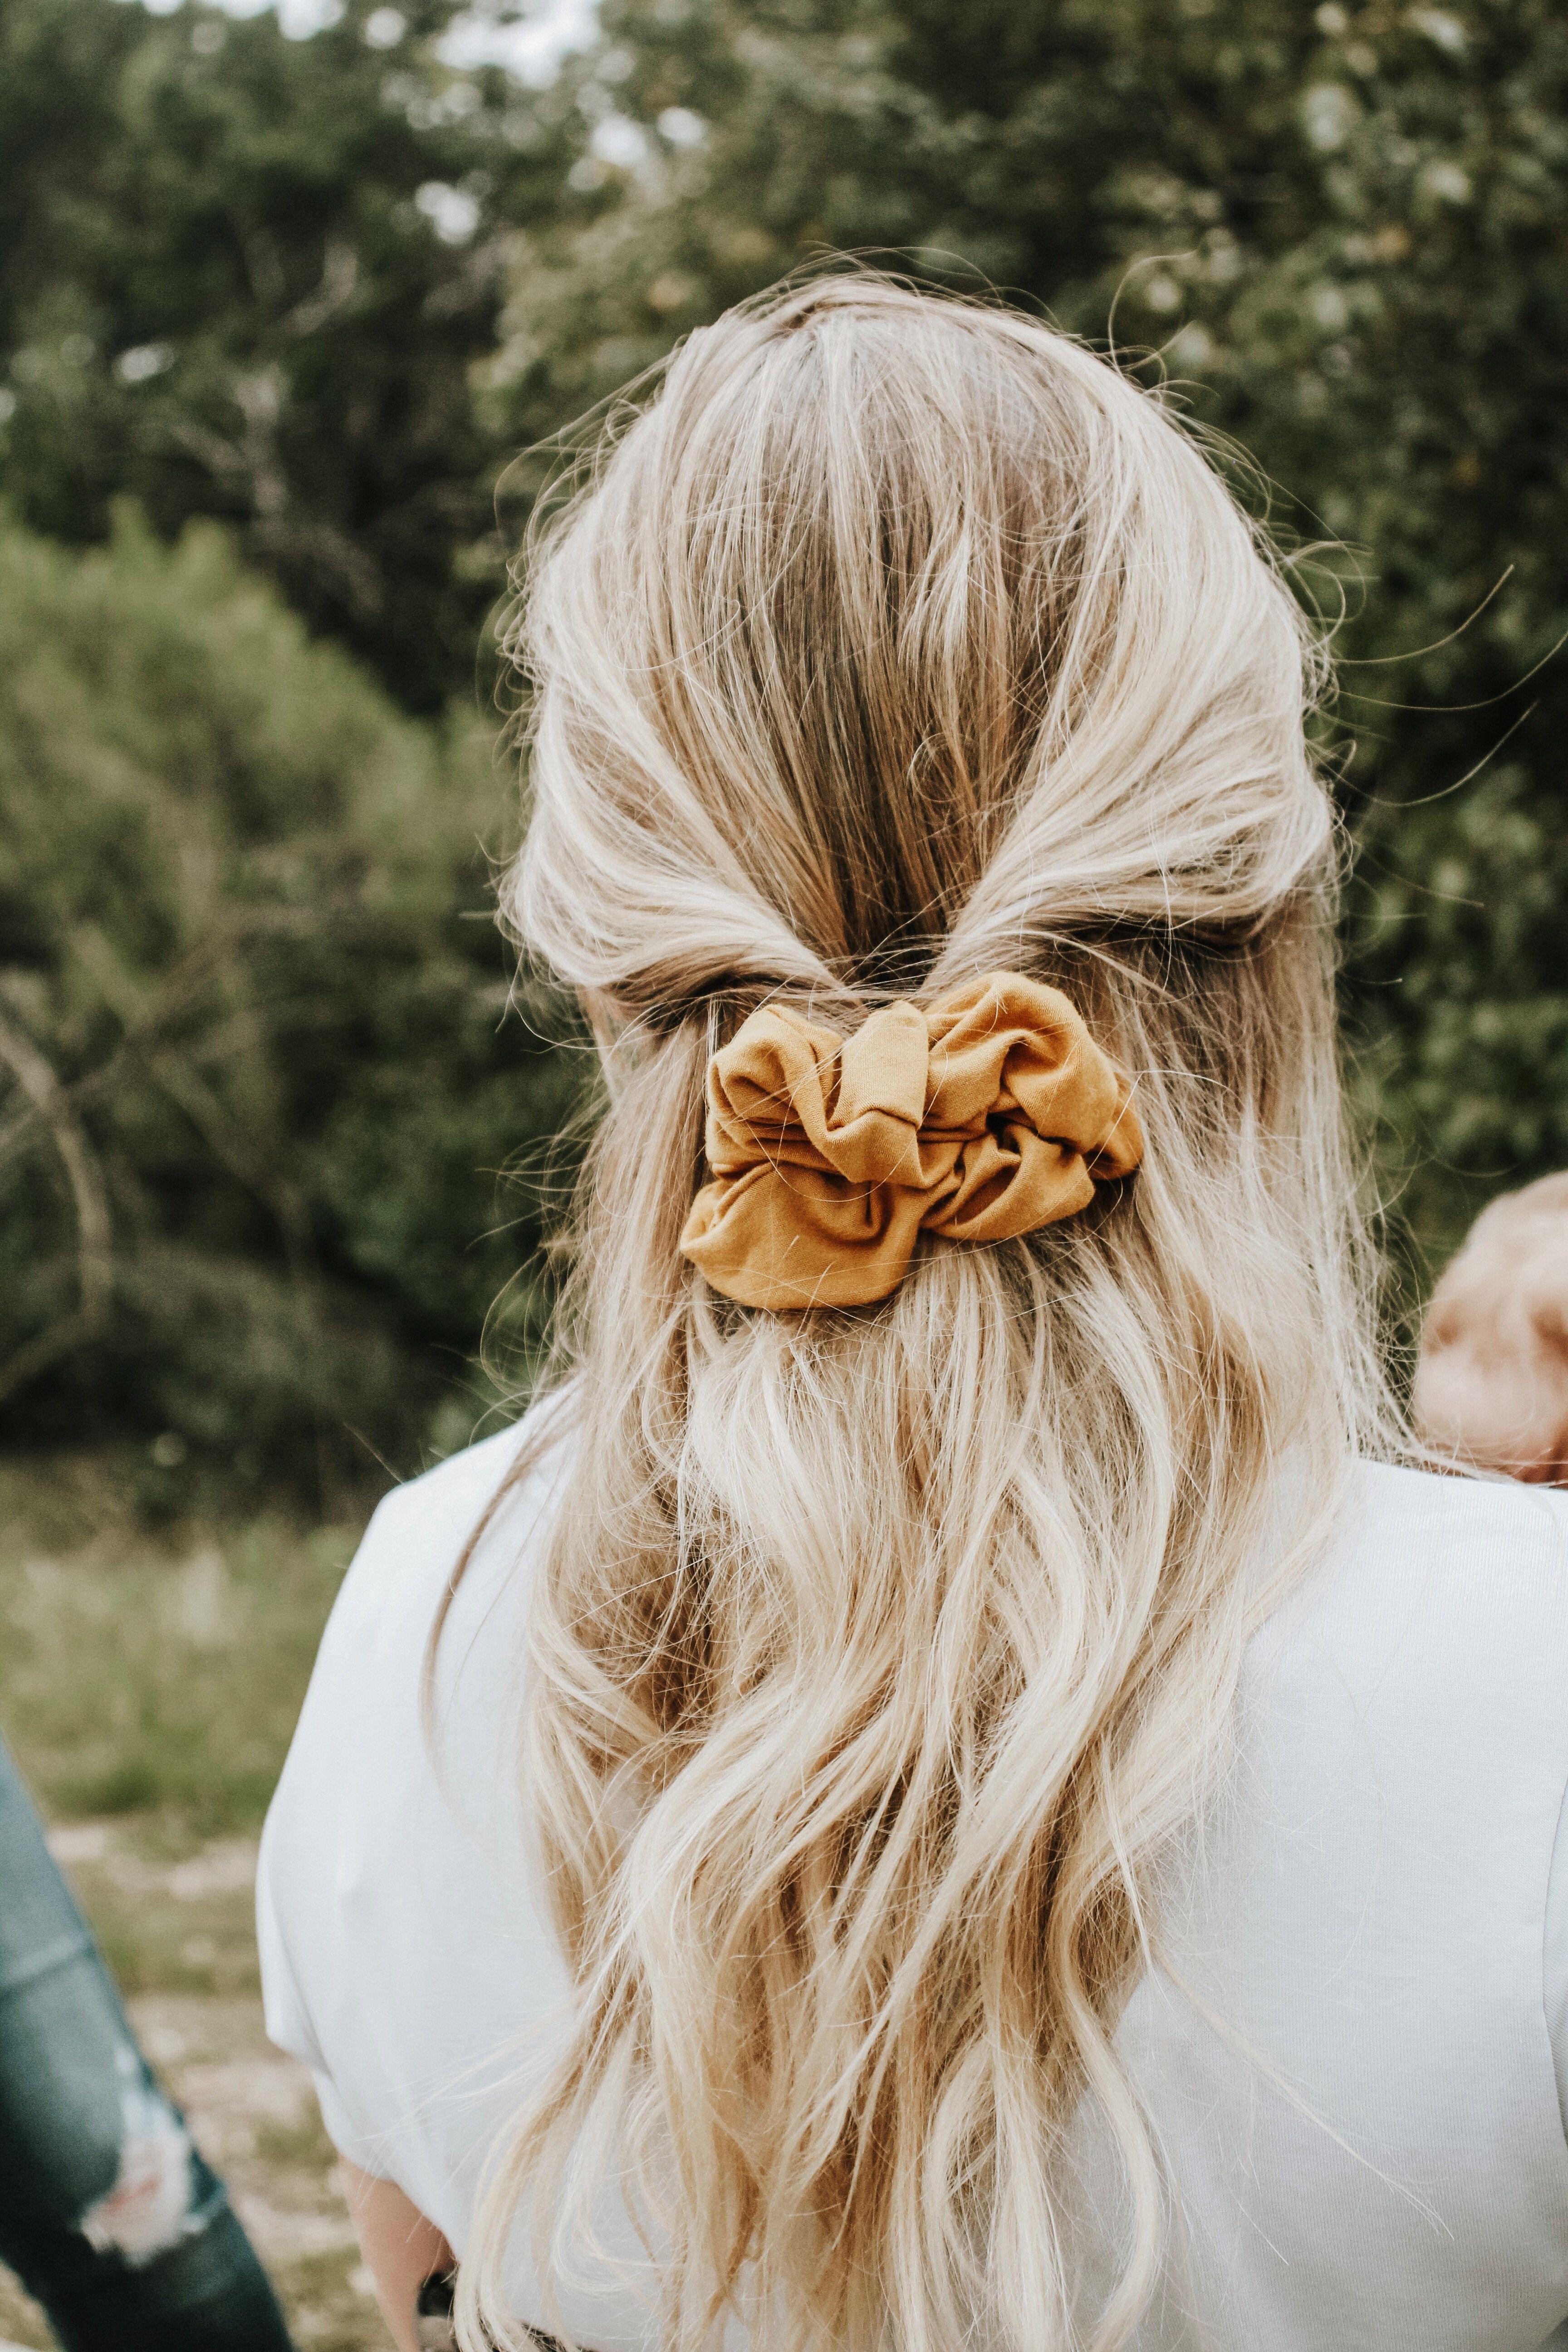 15 Scrunchie Hairstyles - How To Wear a Scrunchie, scrunchie bun, scrunchies, scrunchie hairstyles curly hair,how to use a scrunchie to make a bun